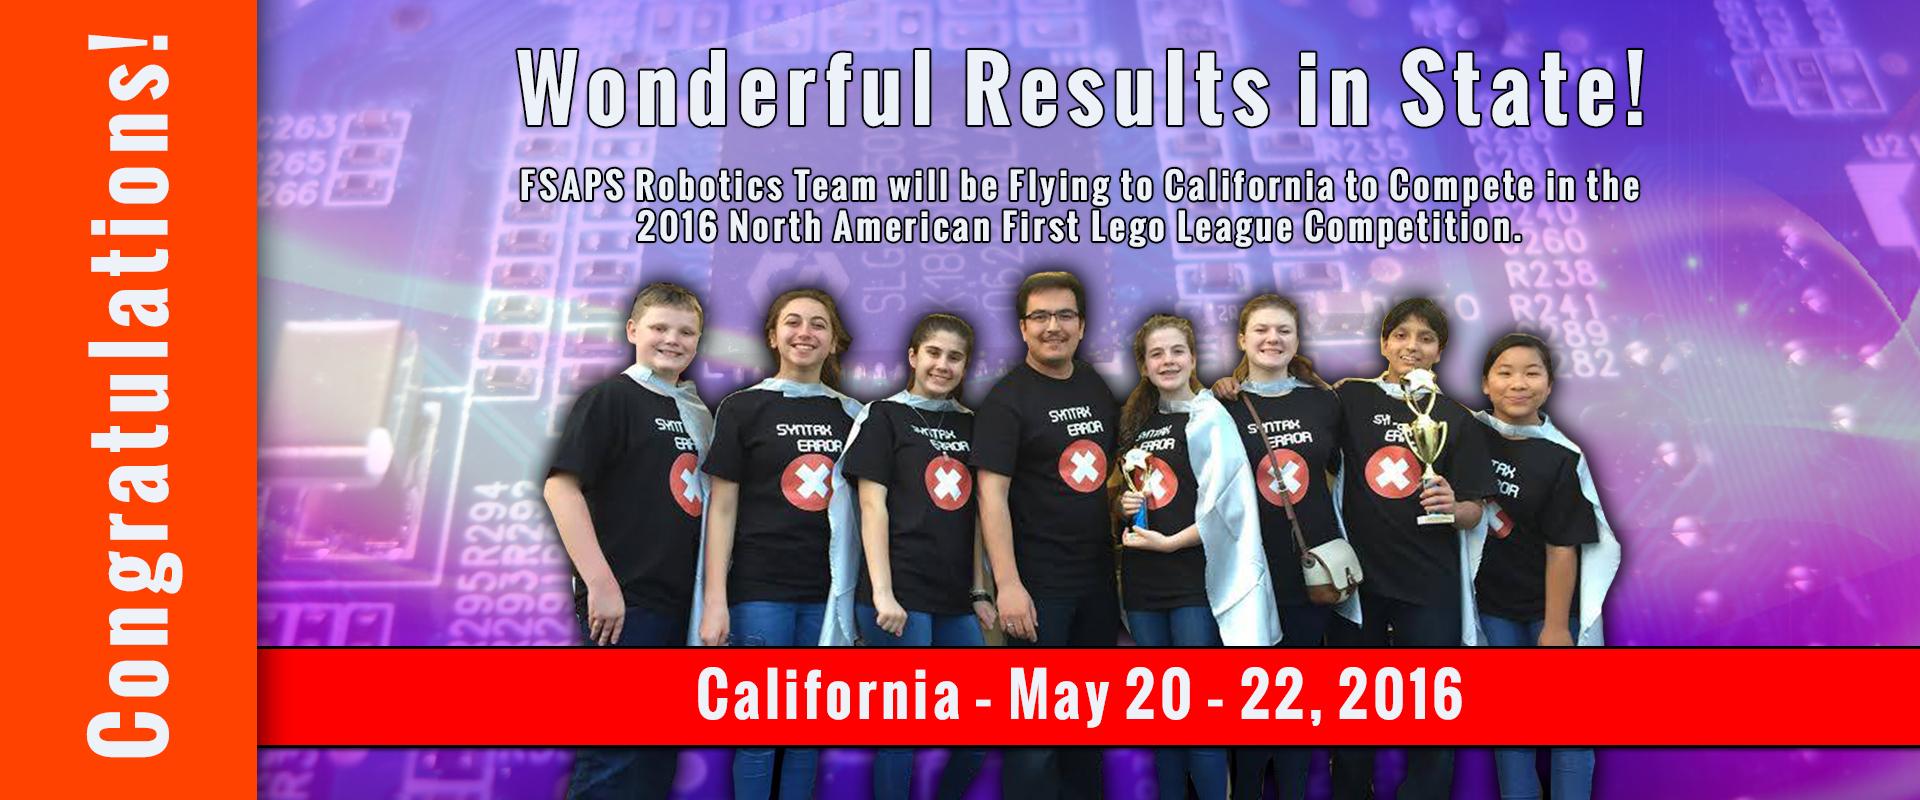 Fulton Science Academy Private School lego_california